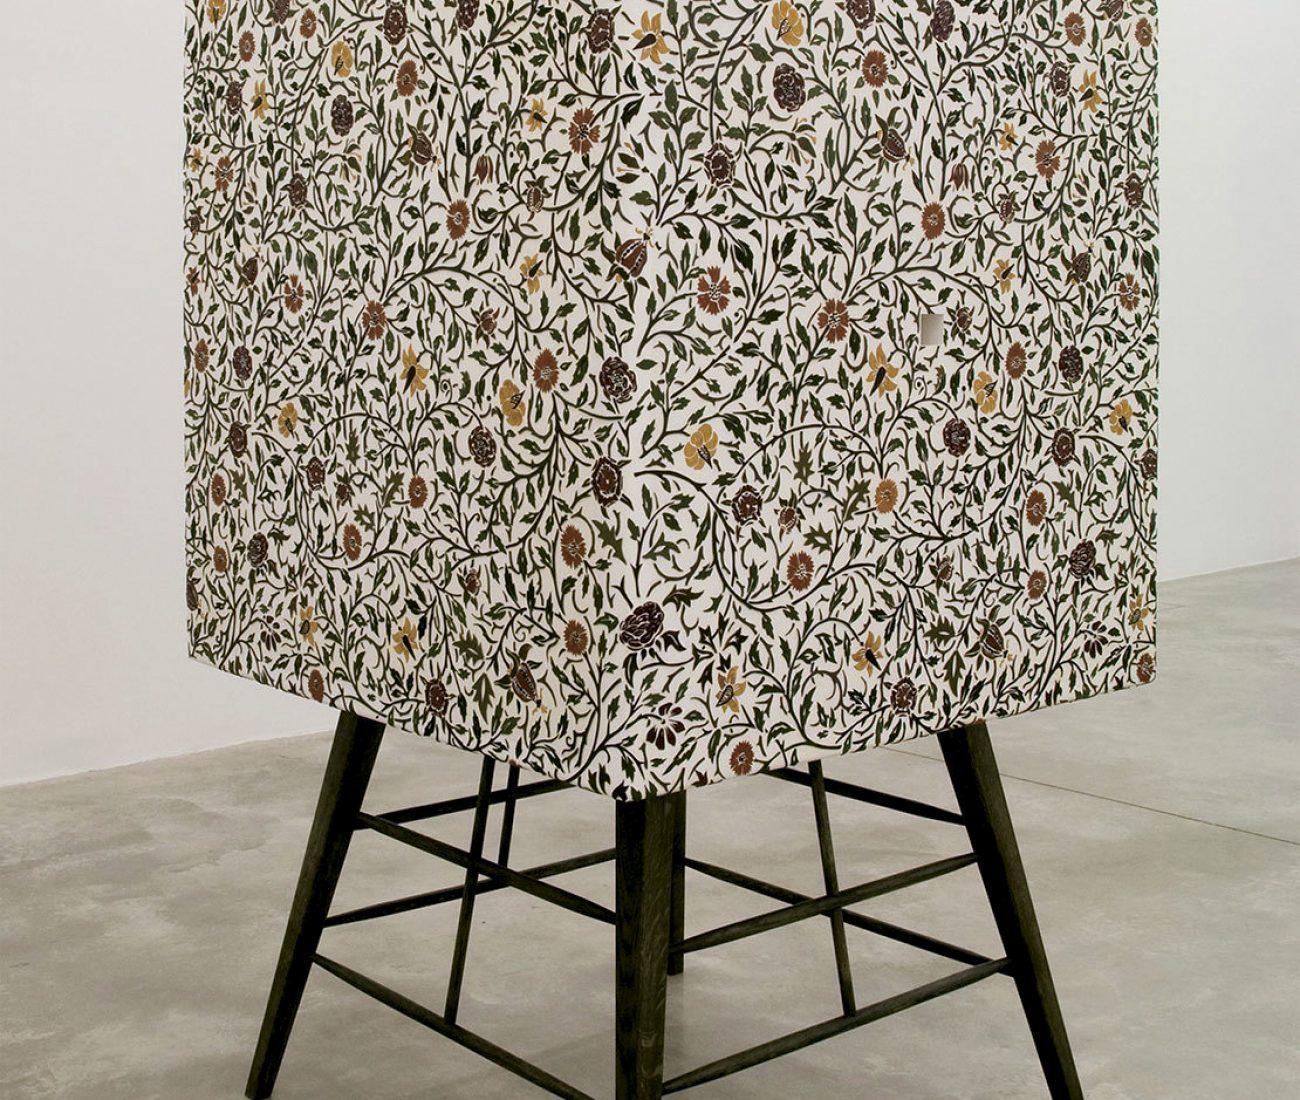 Maureen-Paley-David-Thorpe-Artwork-Private-Lives-2010